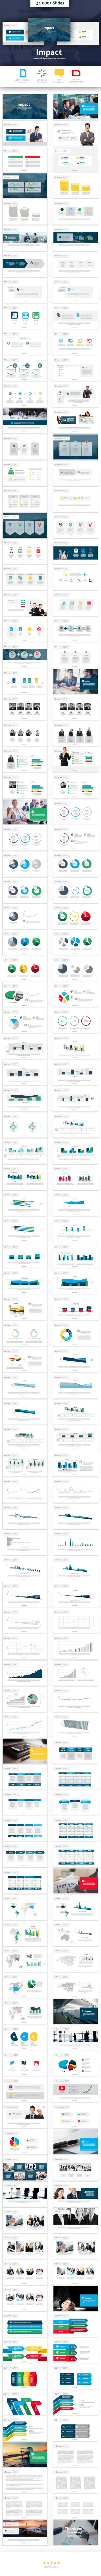 Impact Powerpoint Presentation Template